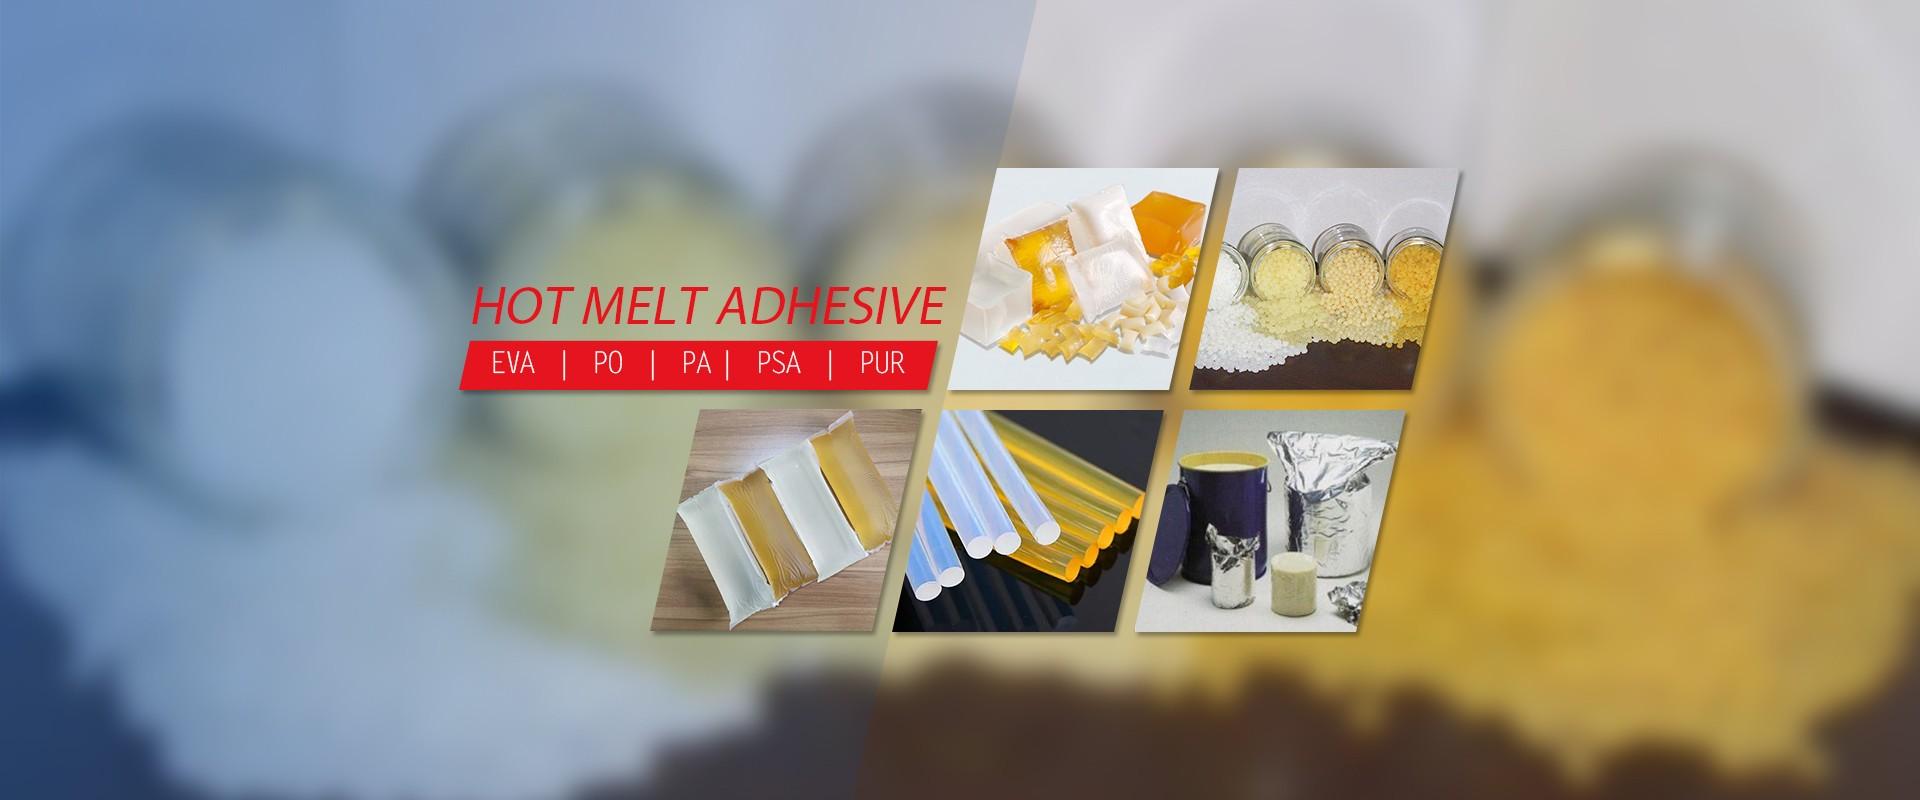 Reactive Polyurethane/ PUR Hot Melt Adhesives